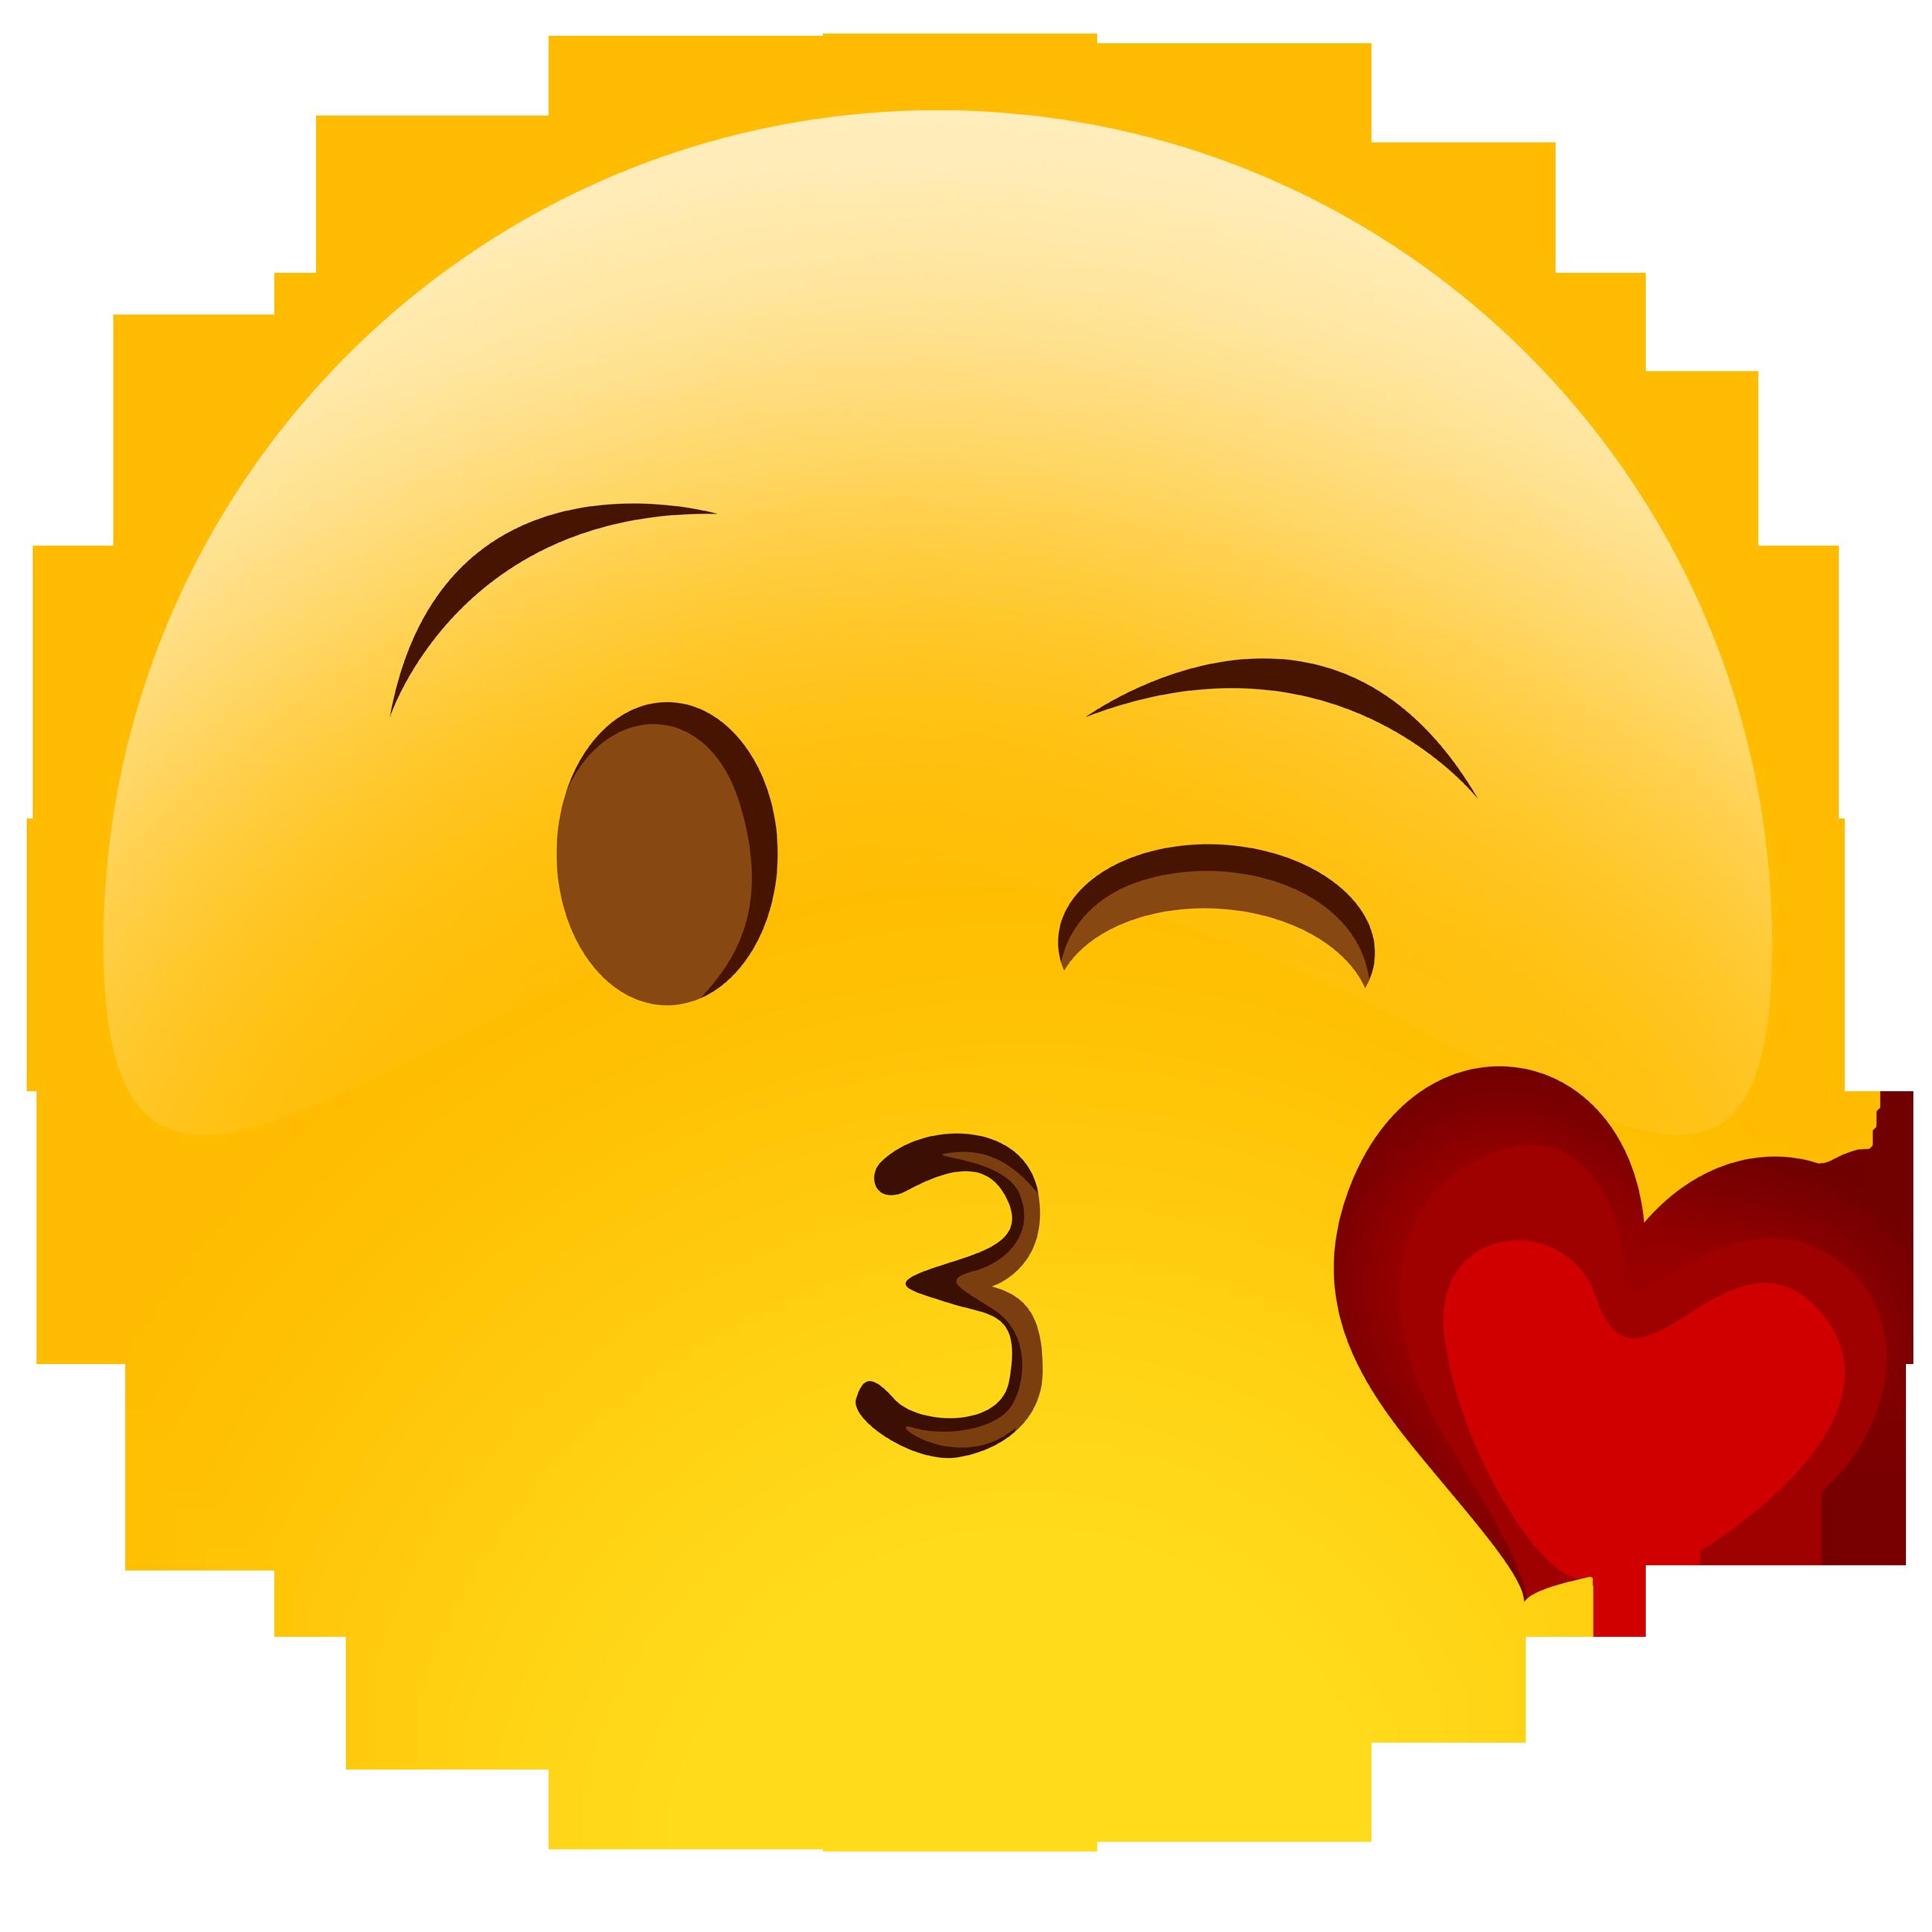 Kisses clipart emoji Sad clipart 138KB Emoticony emoji